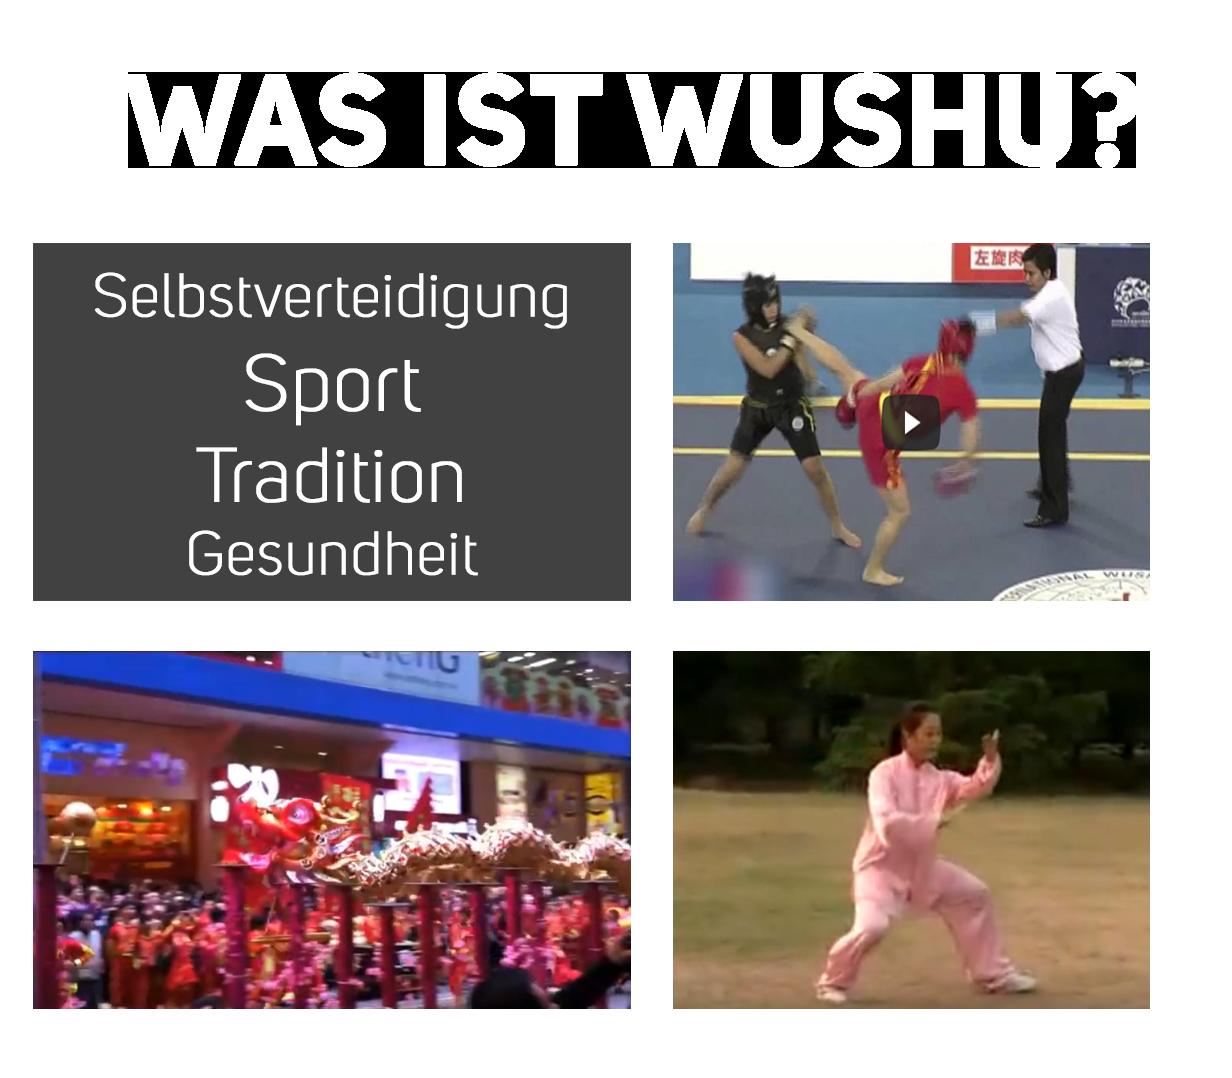 Was ist Wushu